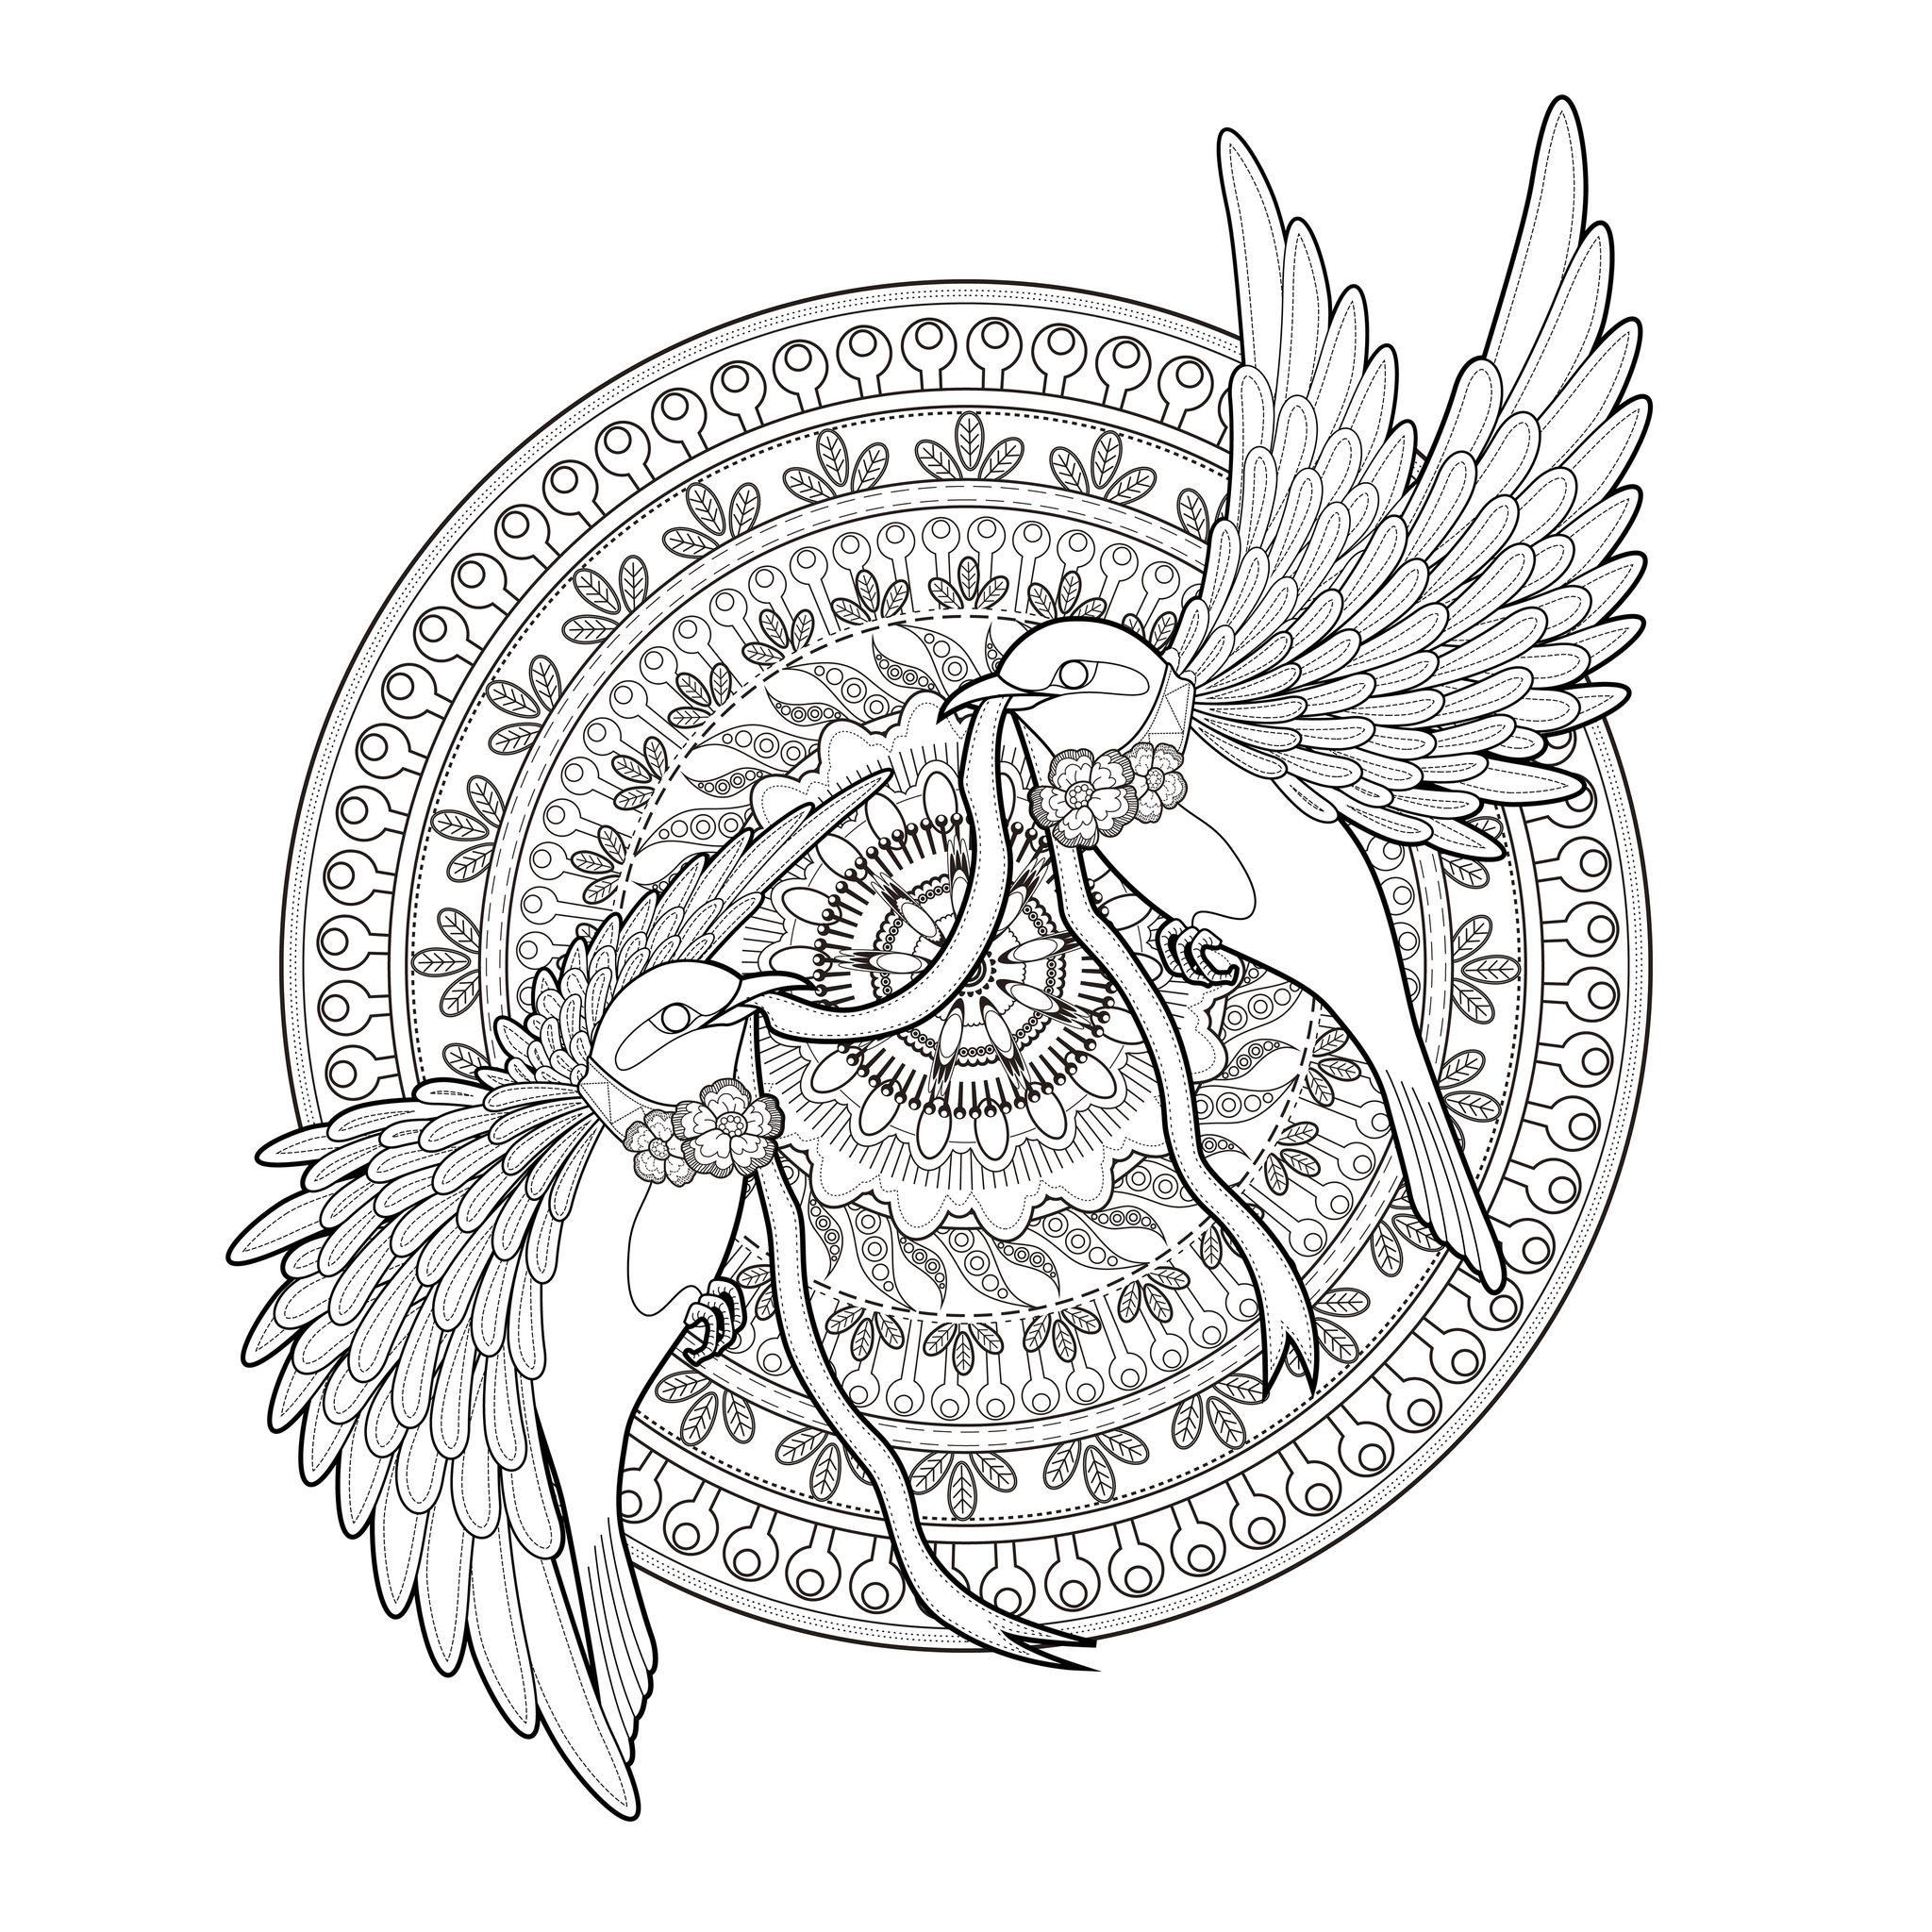 Mandala deux hirondelles et un ruban par kchung